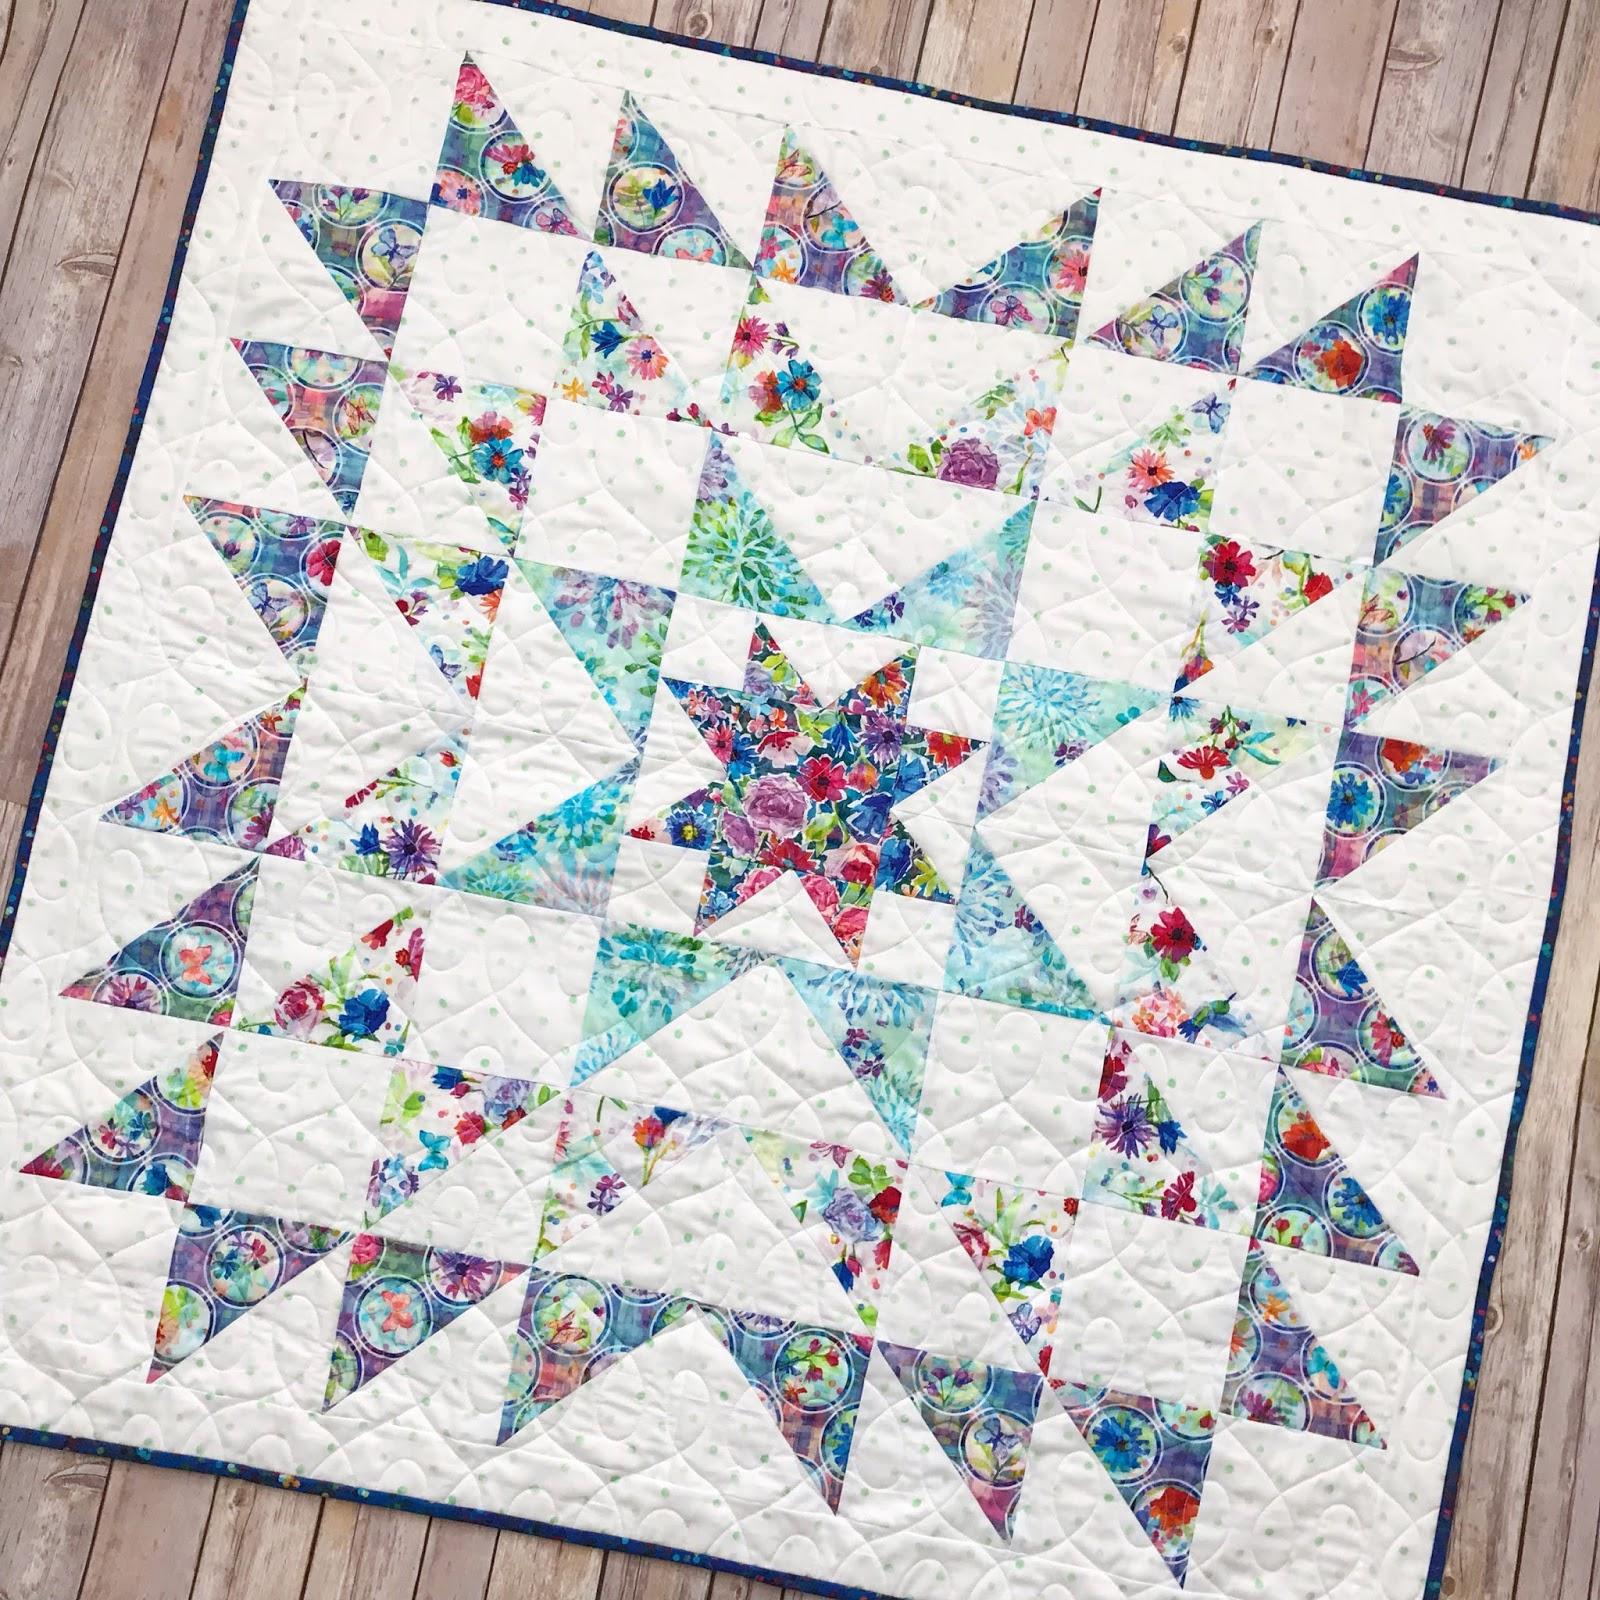 Fort Worth Fabric Studio: Blue Carolina Starburst Quilt {Free Pattern} : starburst quilt - Adamdwight.com